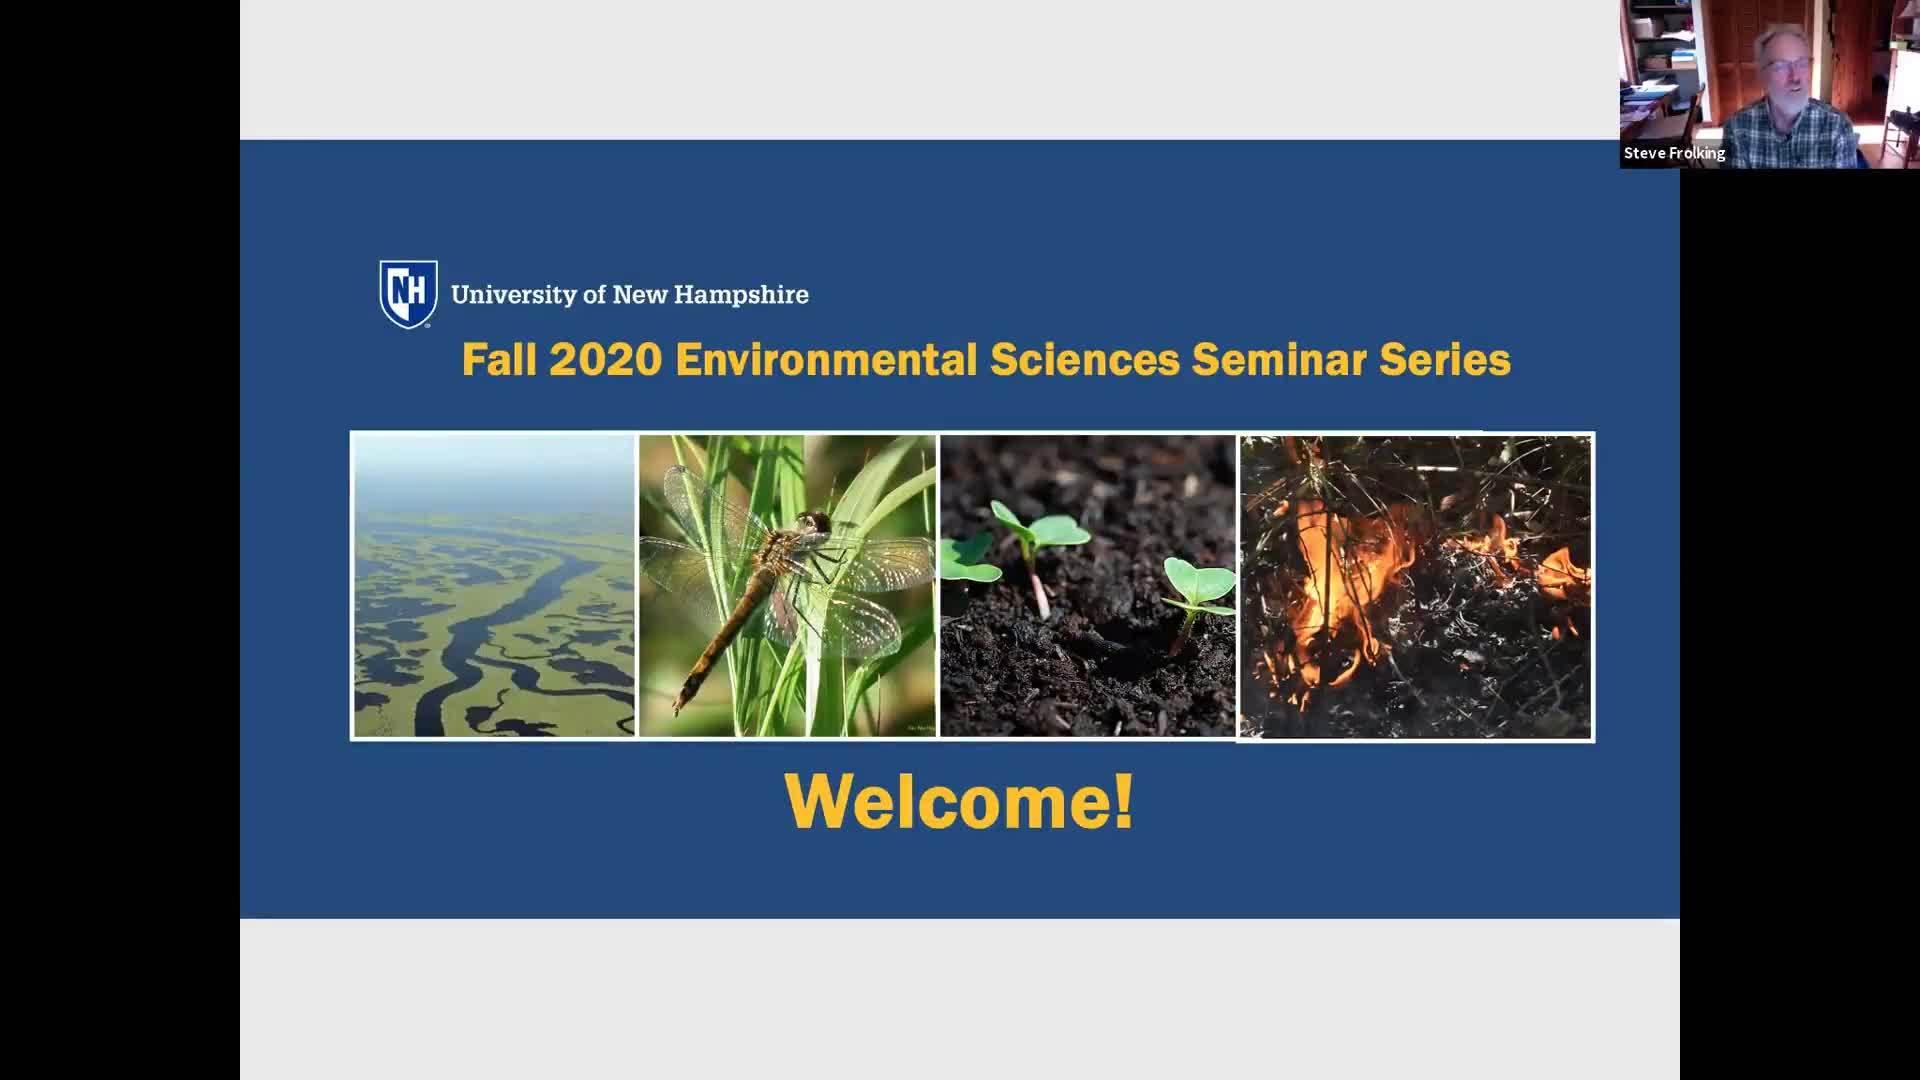 Video thumbnail for Recording 10/14/2020 Diego Riveros-Iregui  UNH Fall 2020 Environmental Sciences Seminar Series